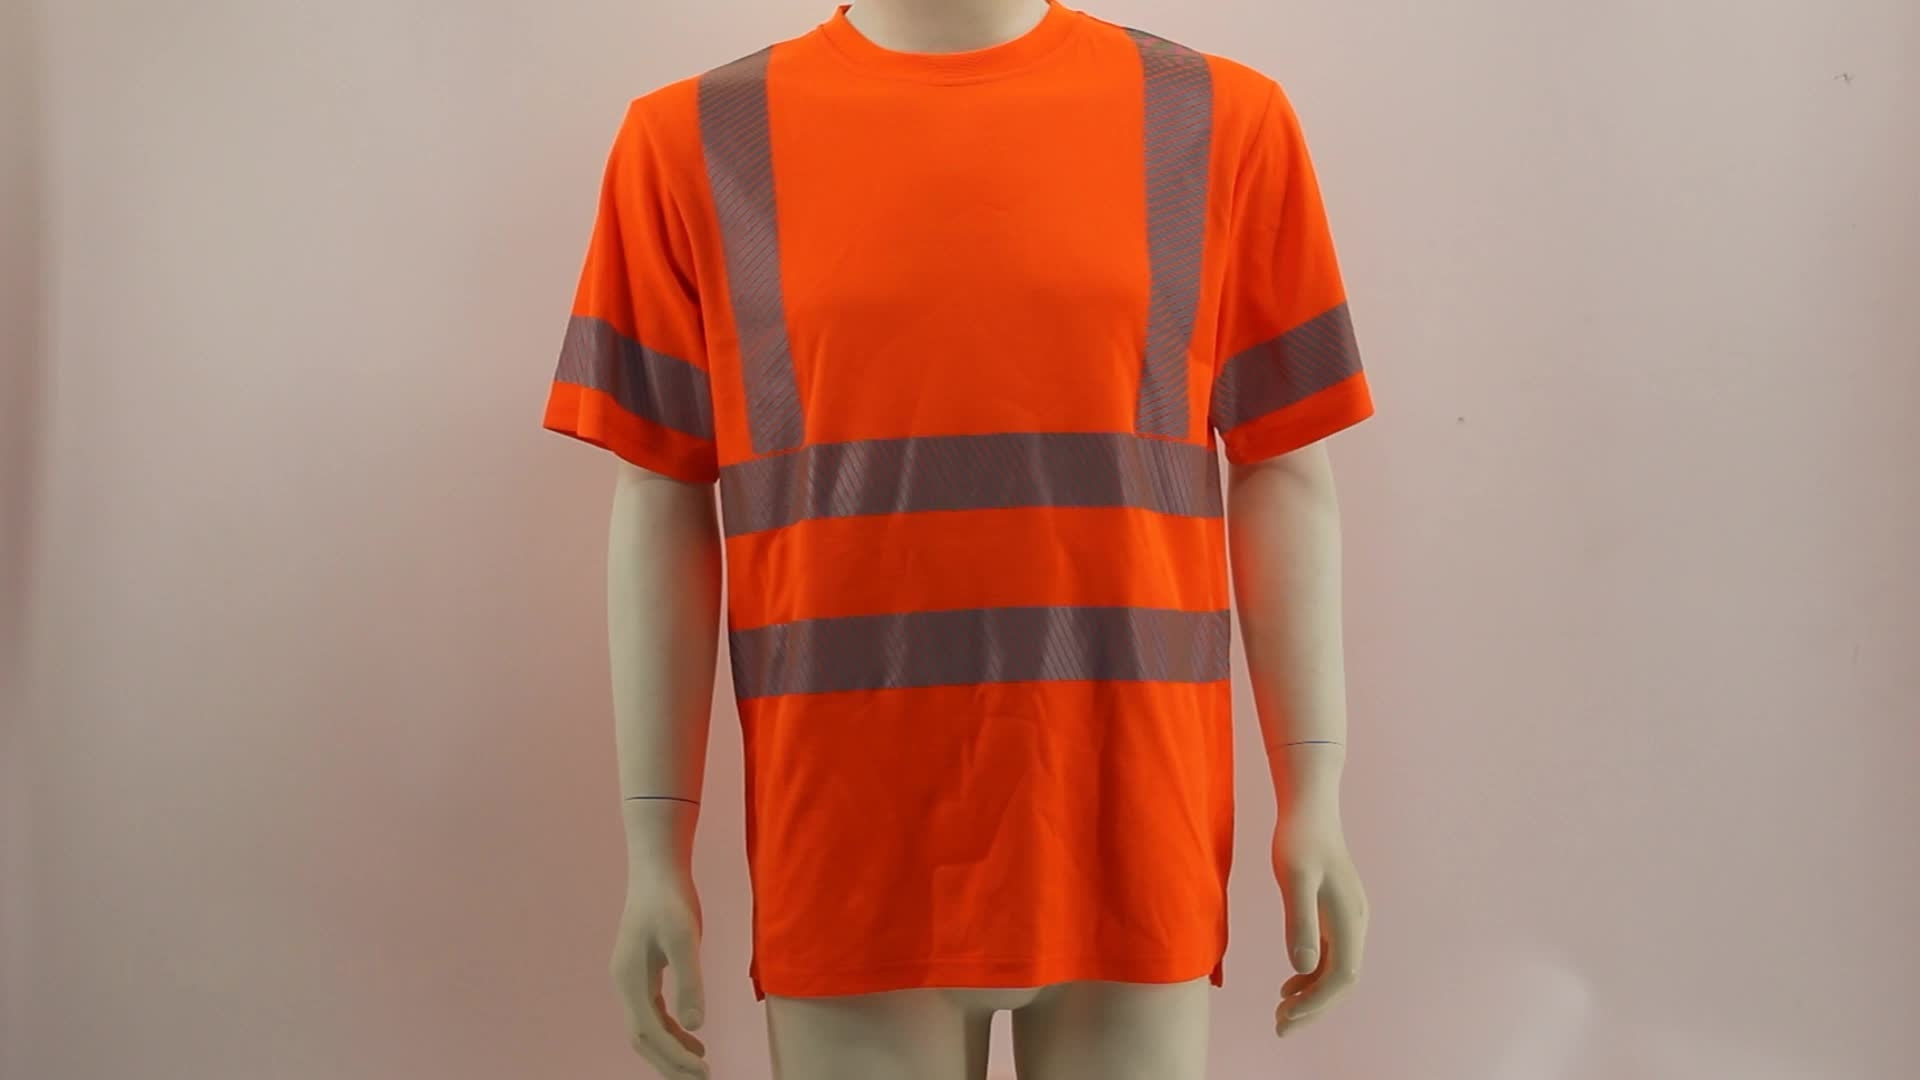 High Visibility Cheap China Wholesale Clothing,High Visibility Shirts Wholesale